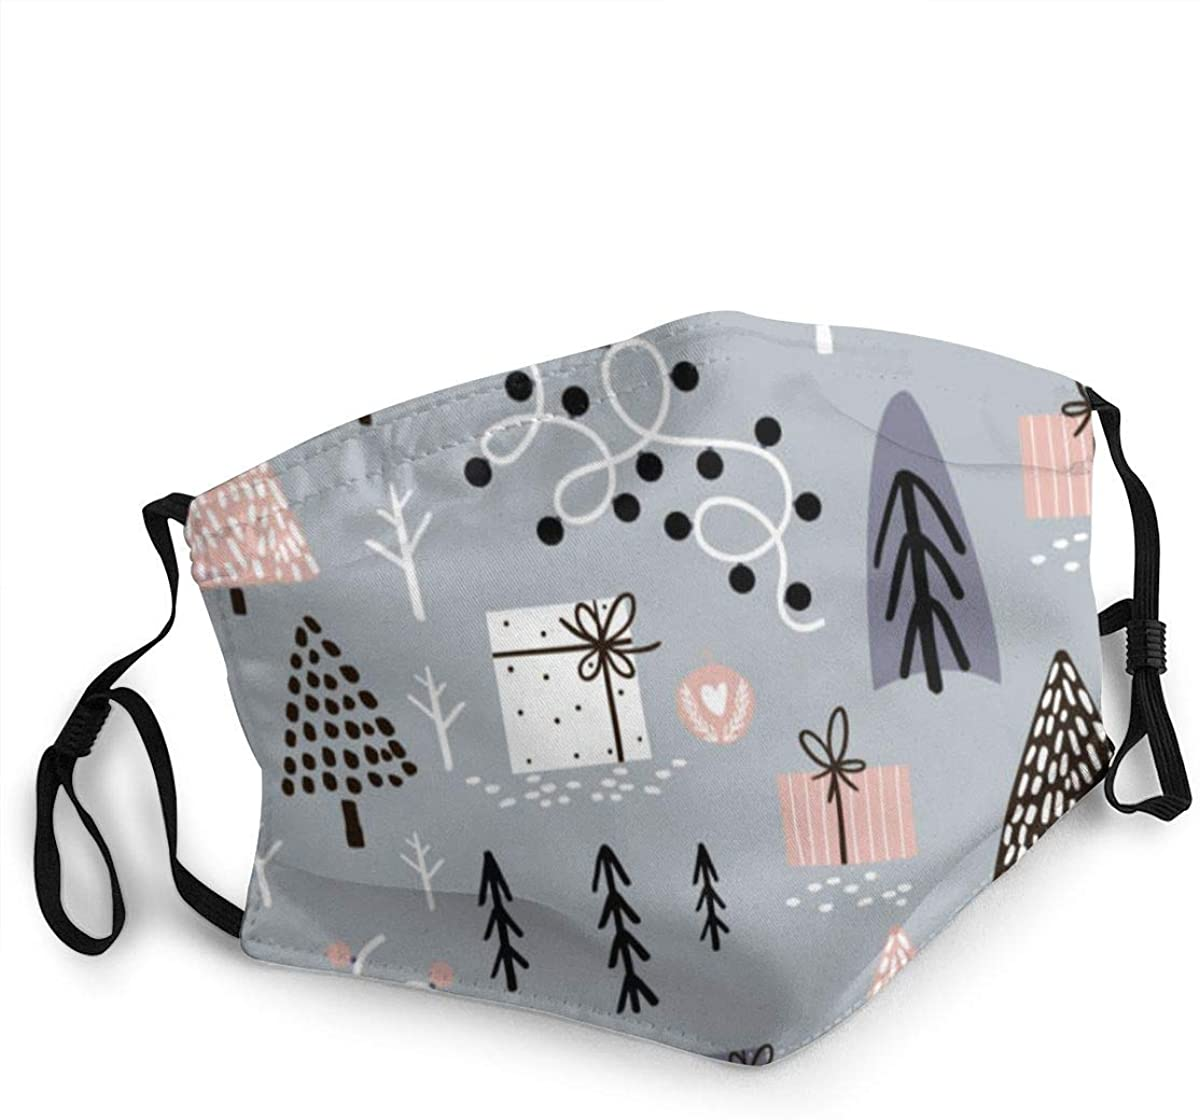 MARTHLORES Fashion Protective, Reusable Cotton Fabric Tree Christmas Light Unisex Cotton, Washable,Adjustable, Reusable.